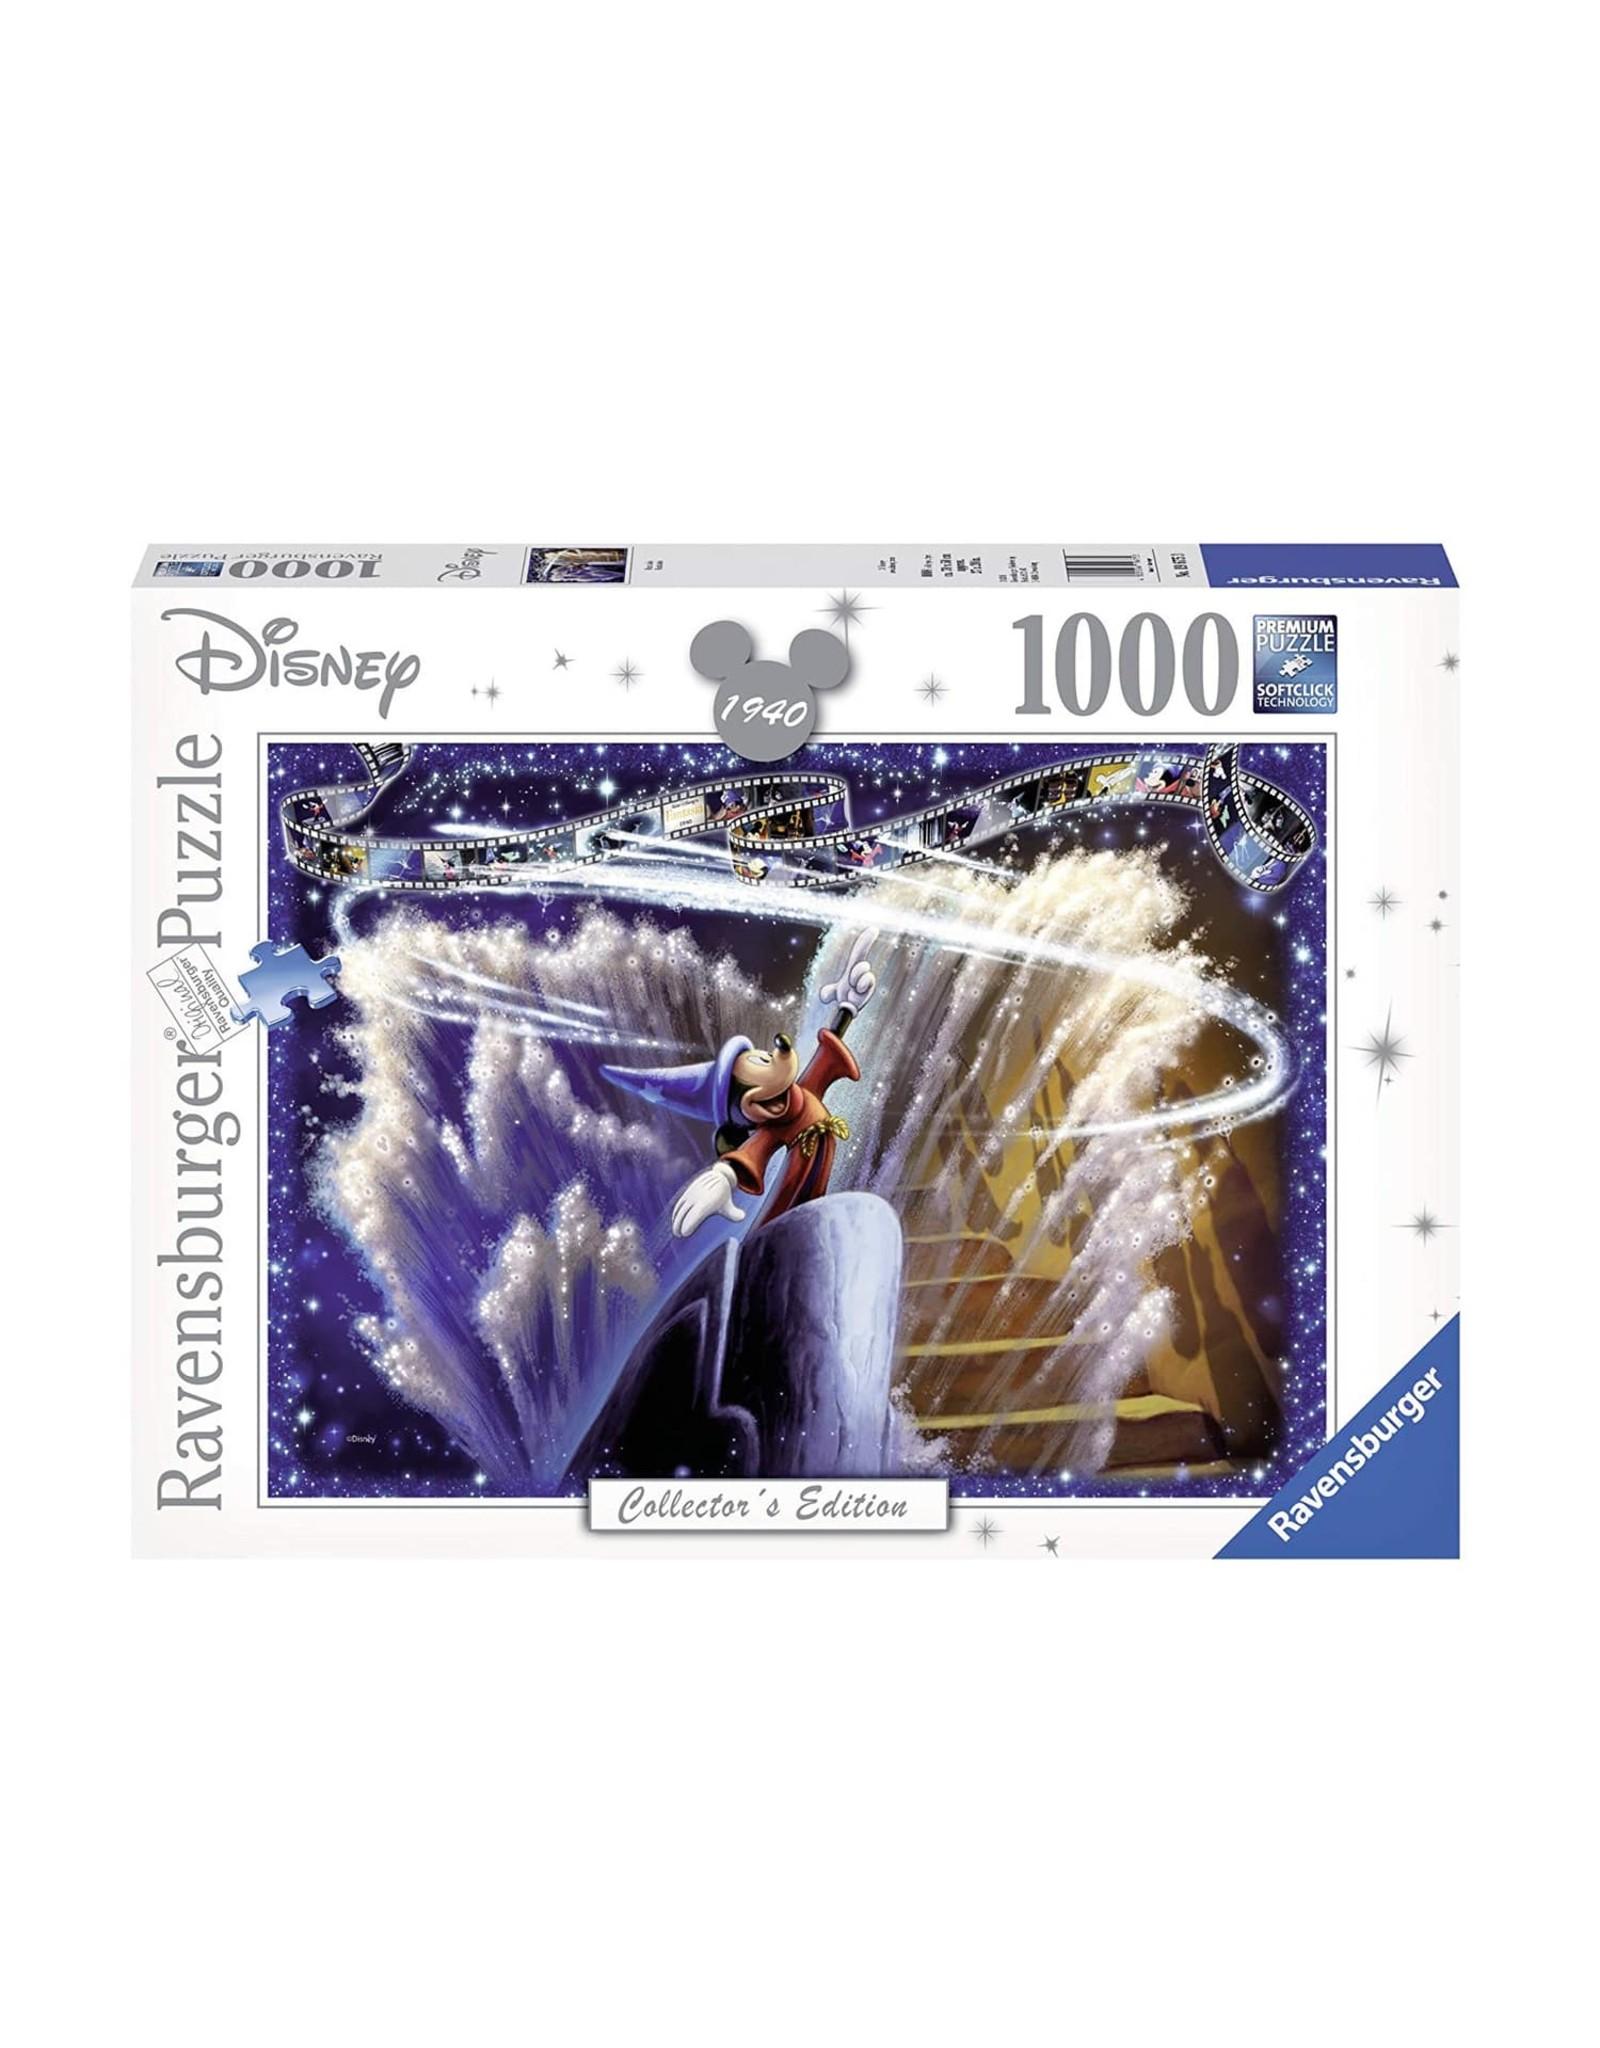 Ravensburger FANTASIA Puzzle 1000P - Collector's Edition